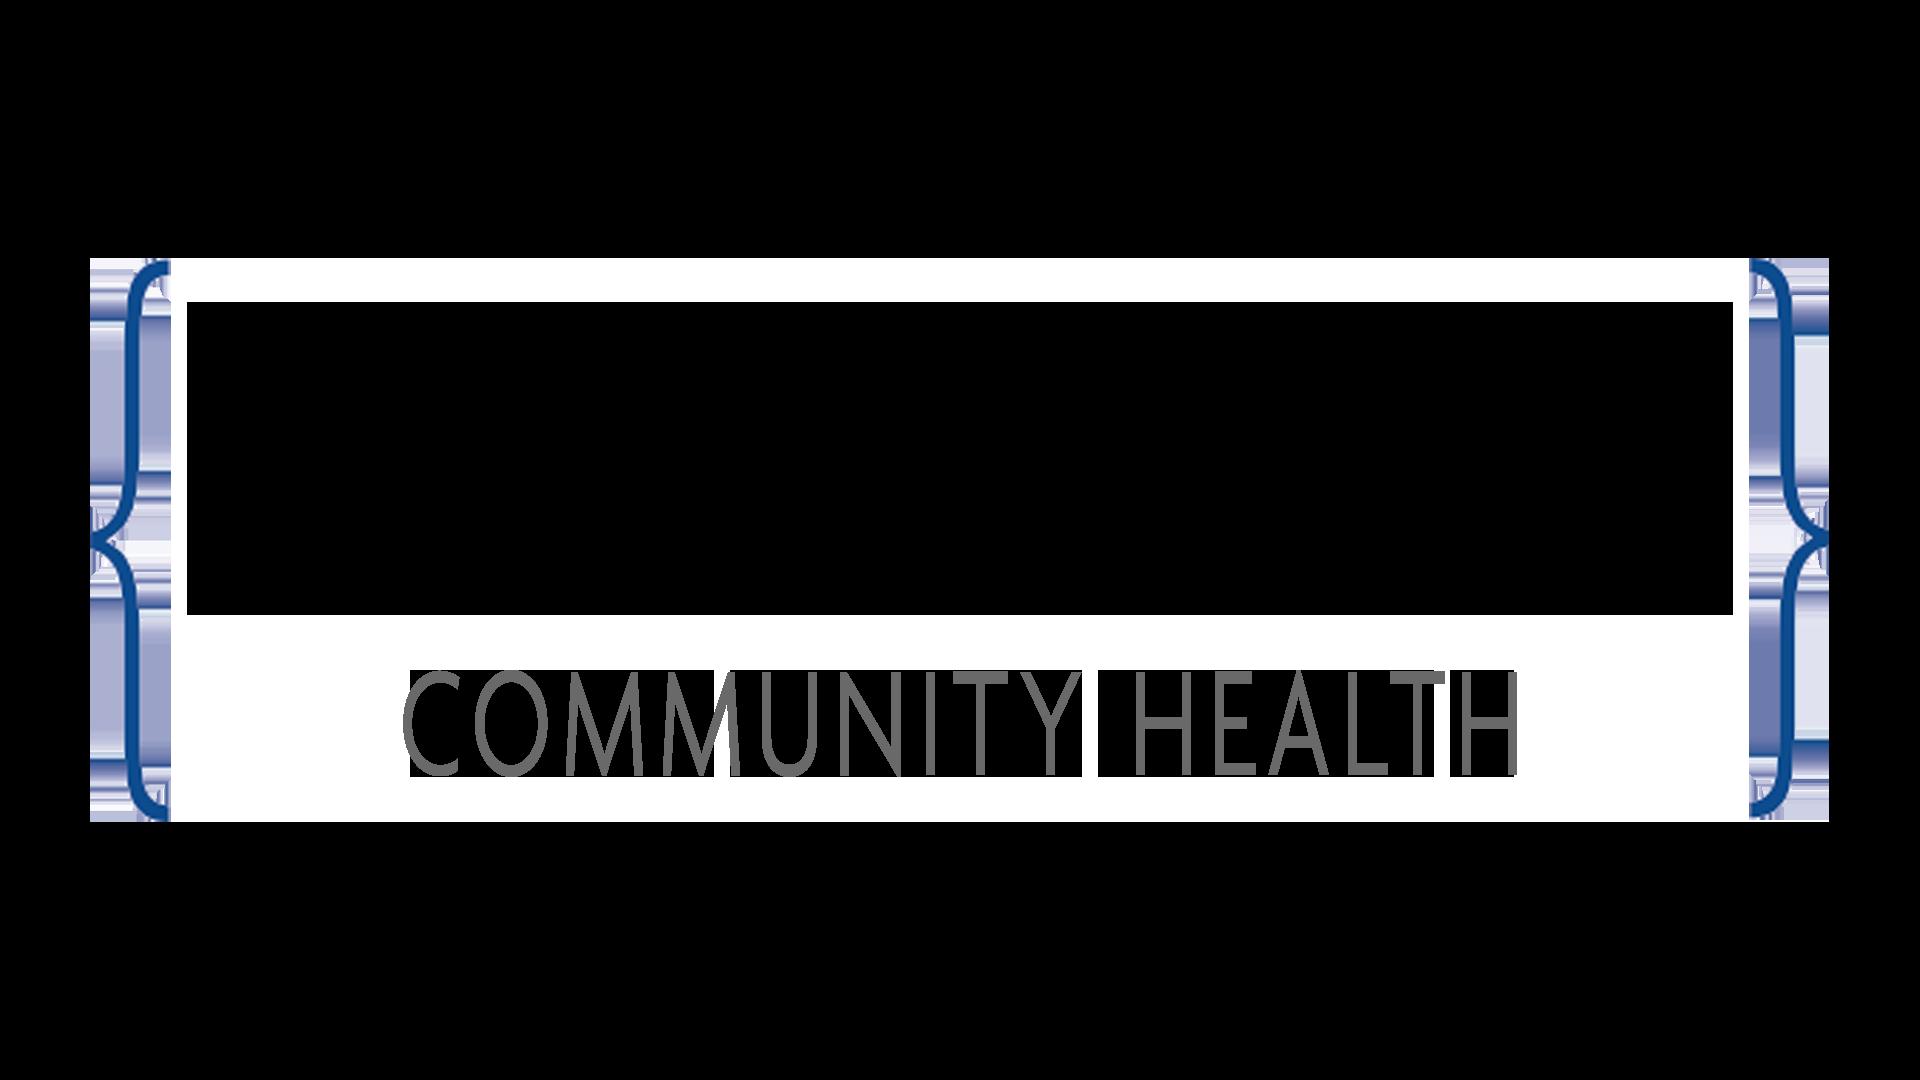 HEADLINE: Community Health RGB logo treatment